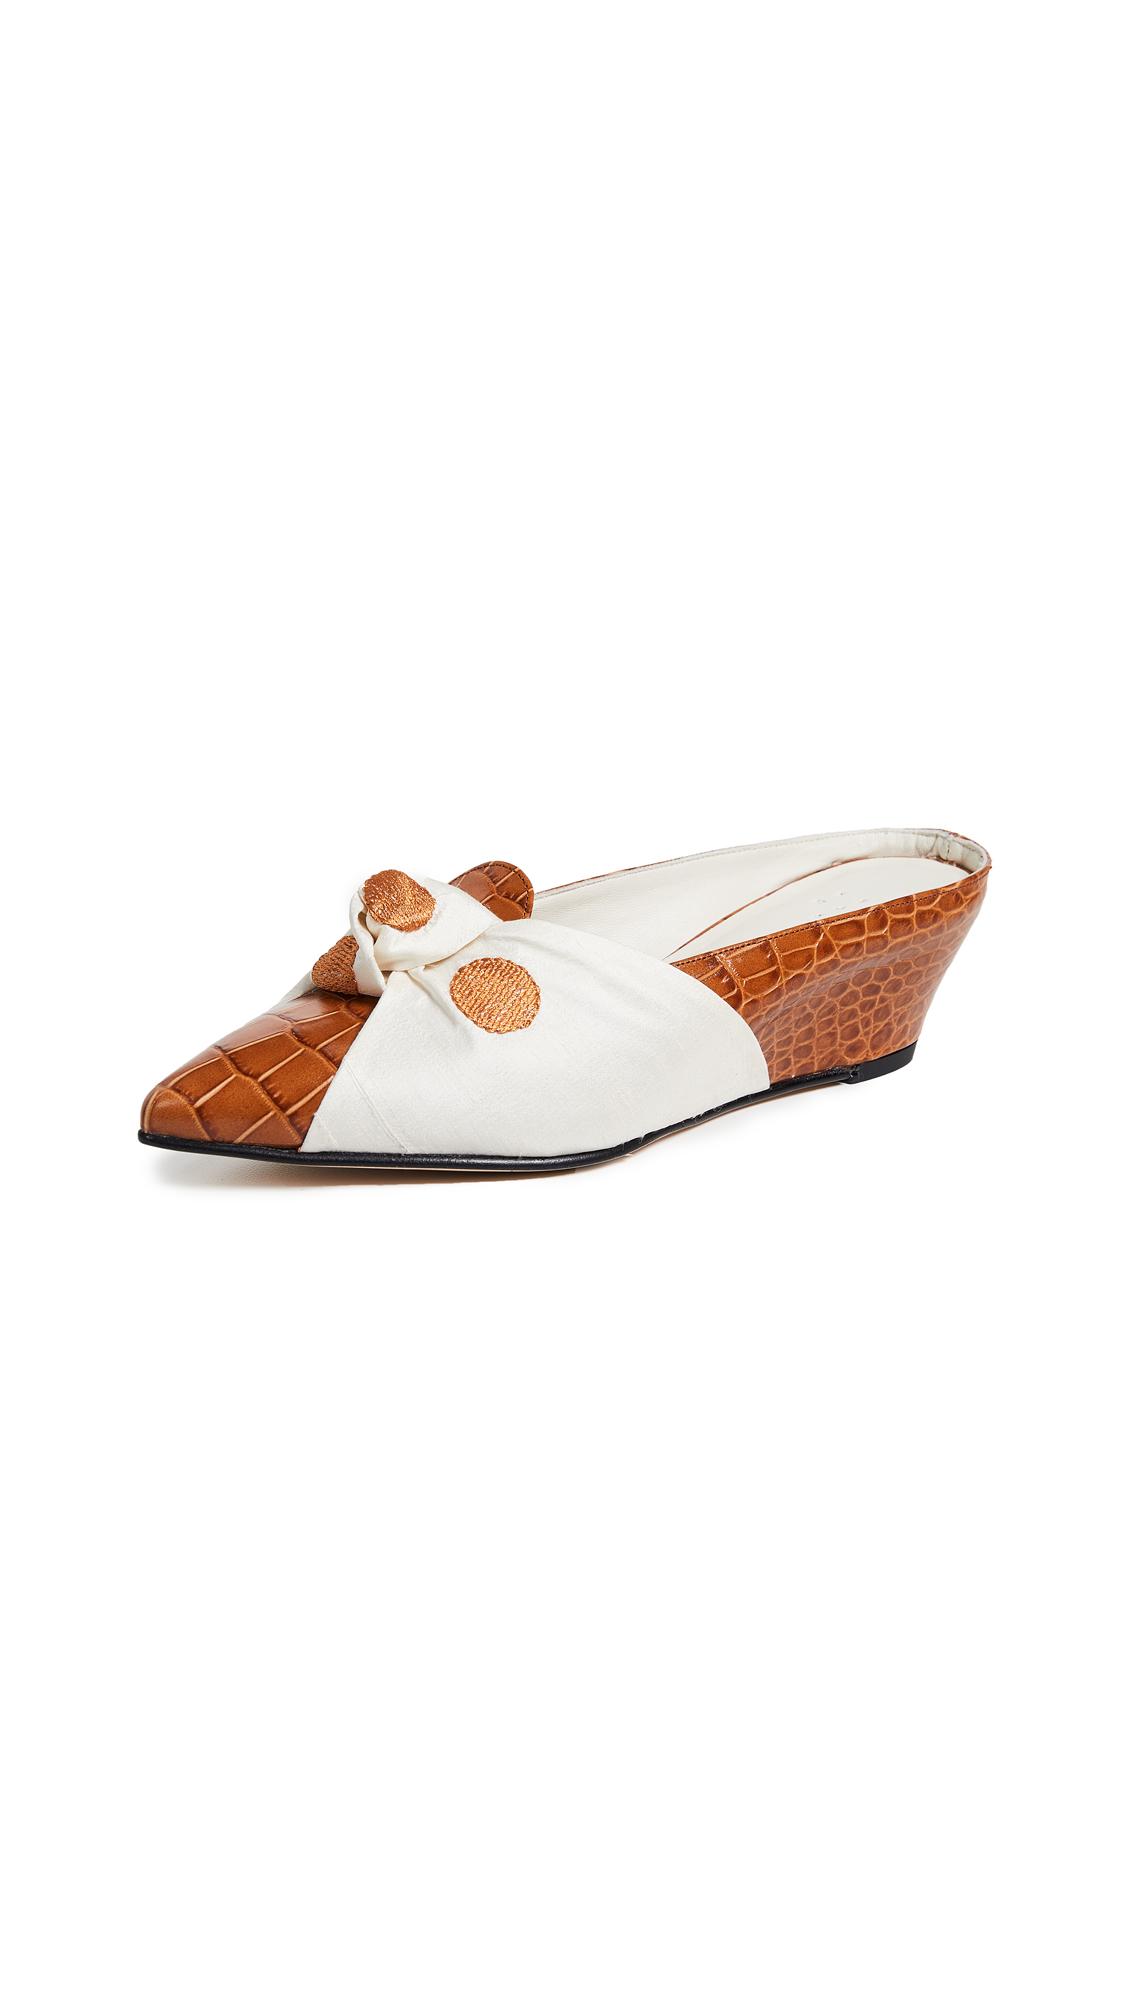 Trademark Adrien Tie Mules - Tan Croc